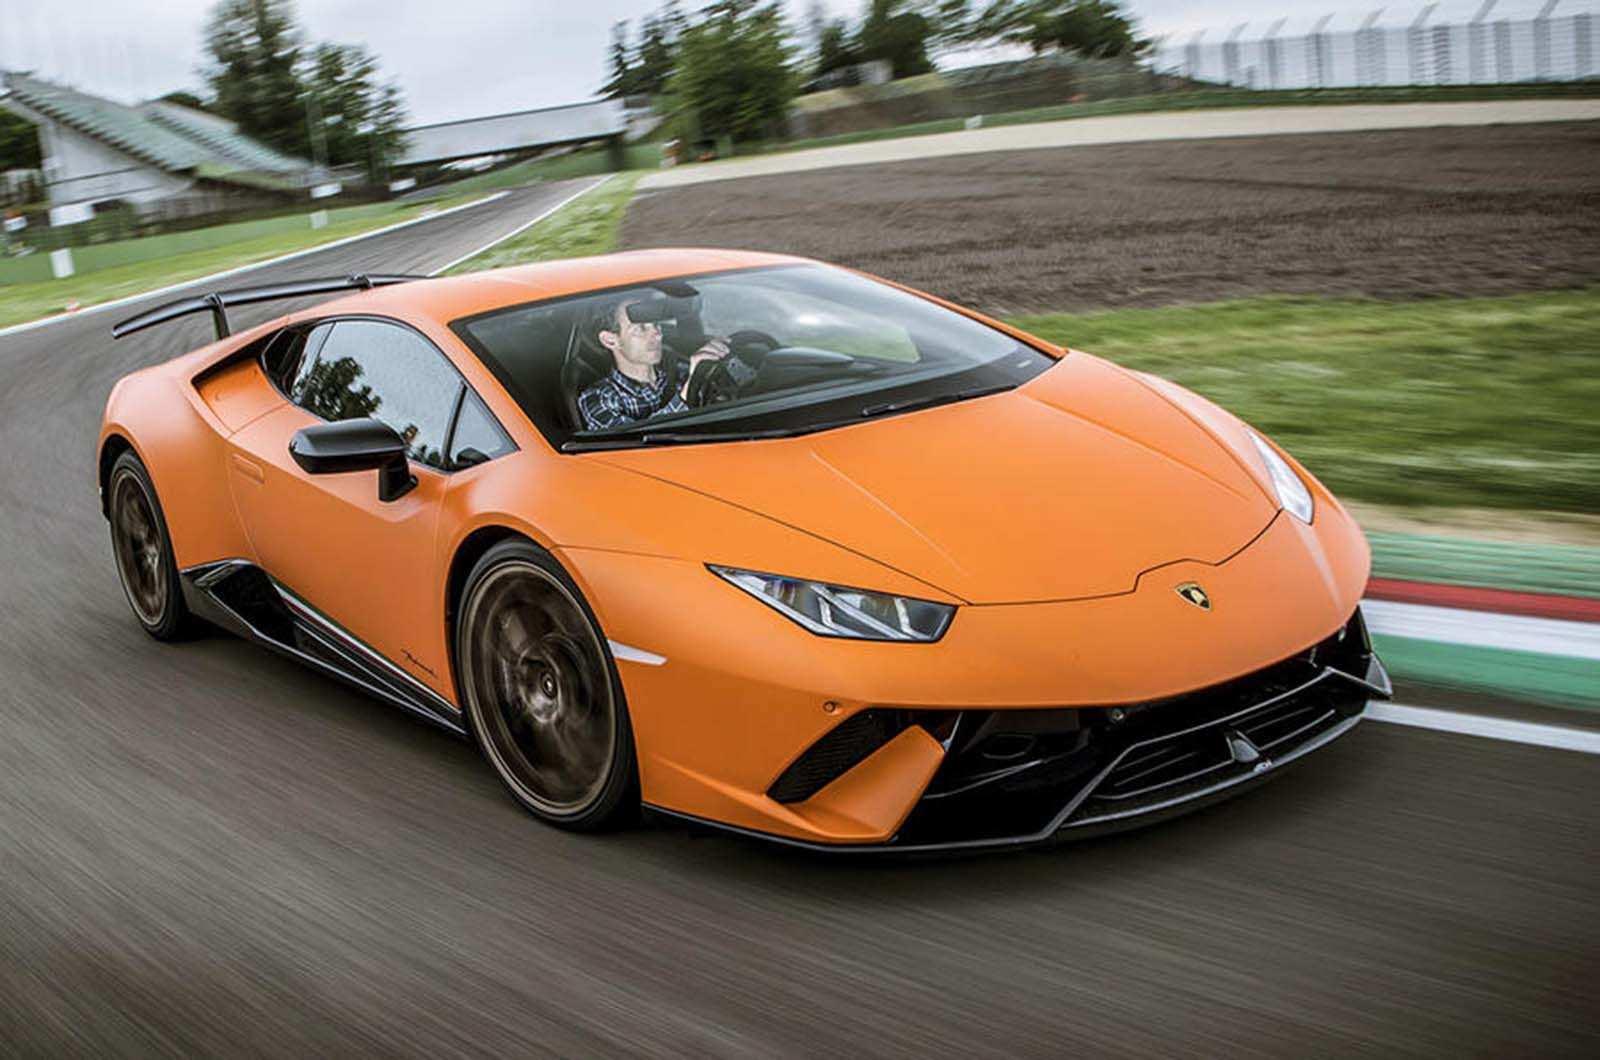 26 Great Lamborghini 2020 Models Release Date by Lamborghini 2020 Models